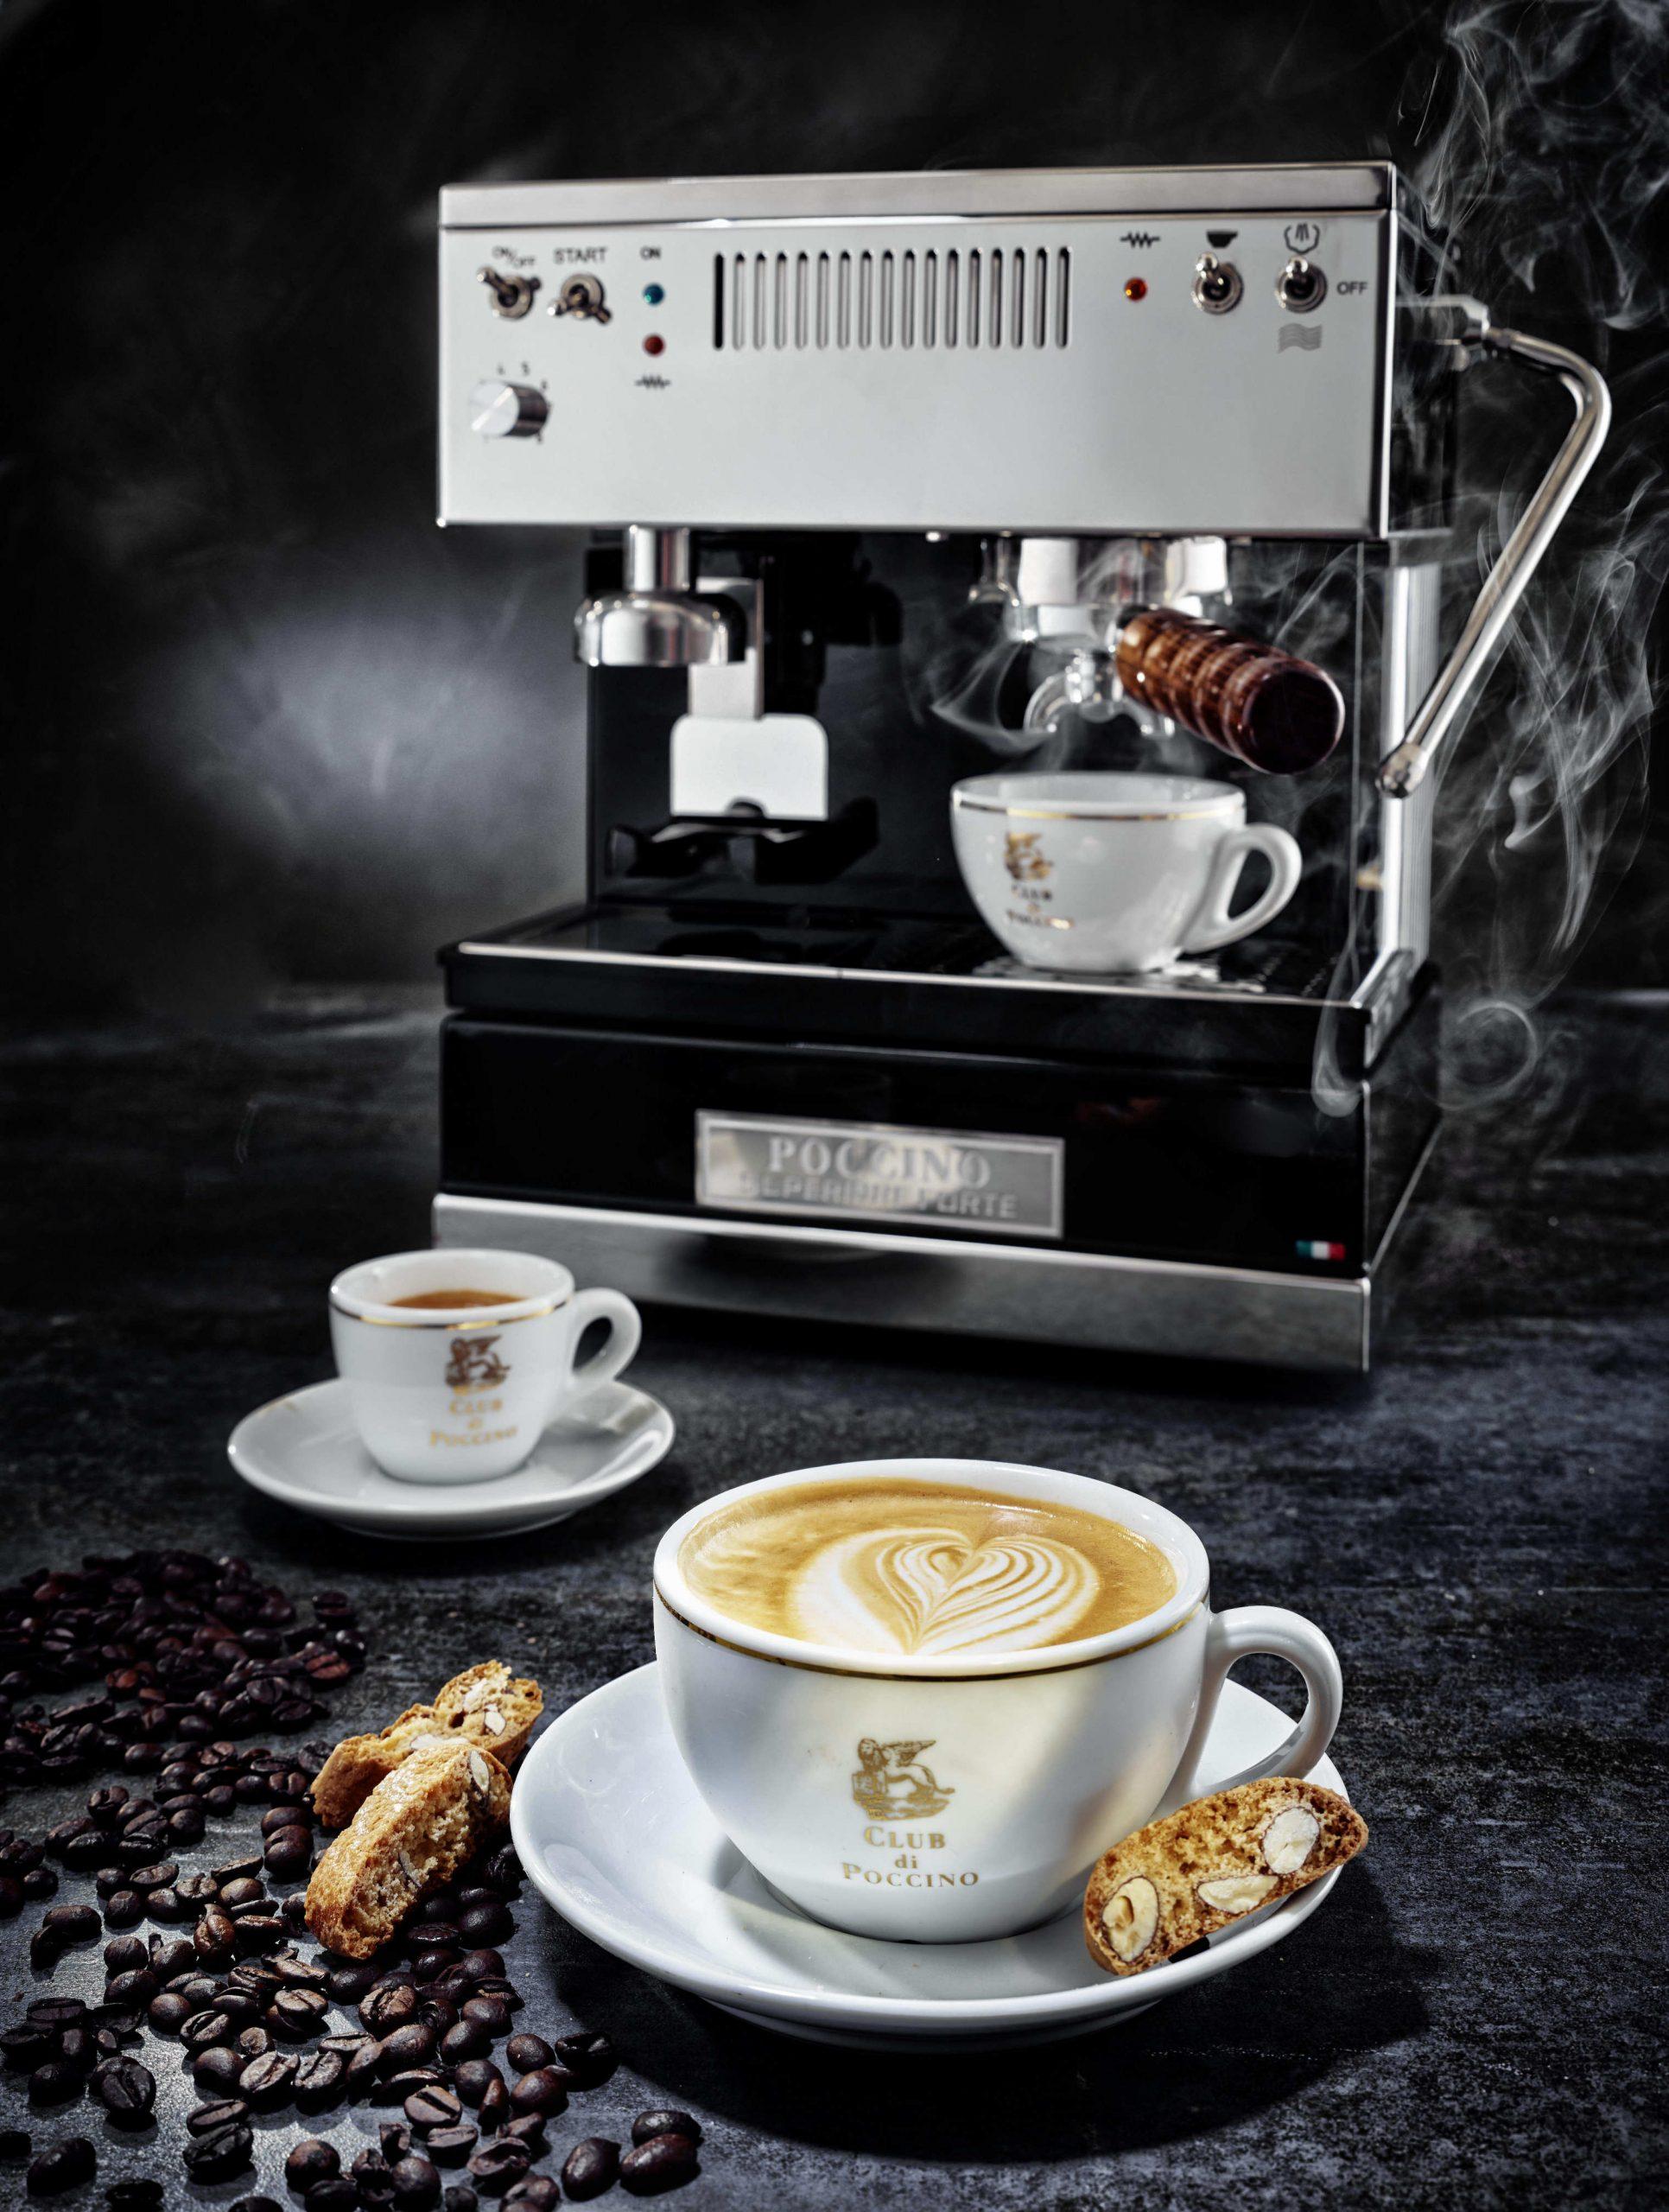 Poccino Espressomaschine